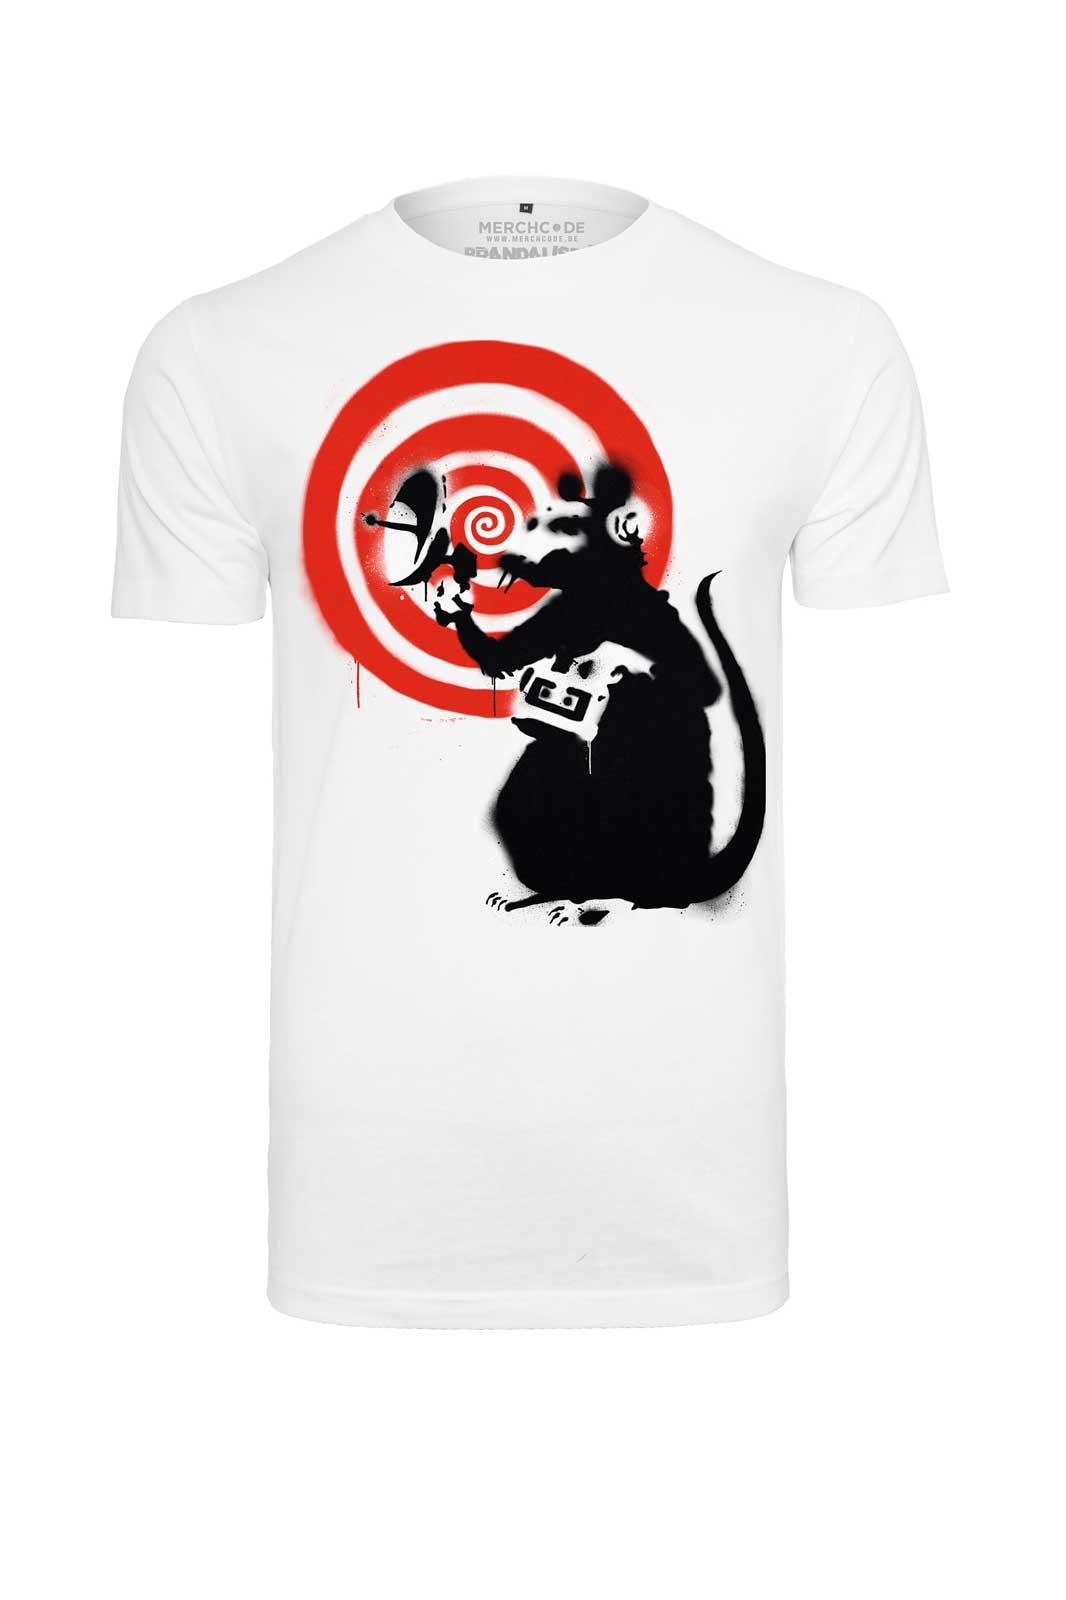 Tee Banksy Spy Rat Front